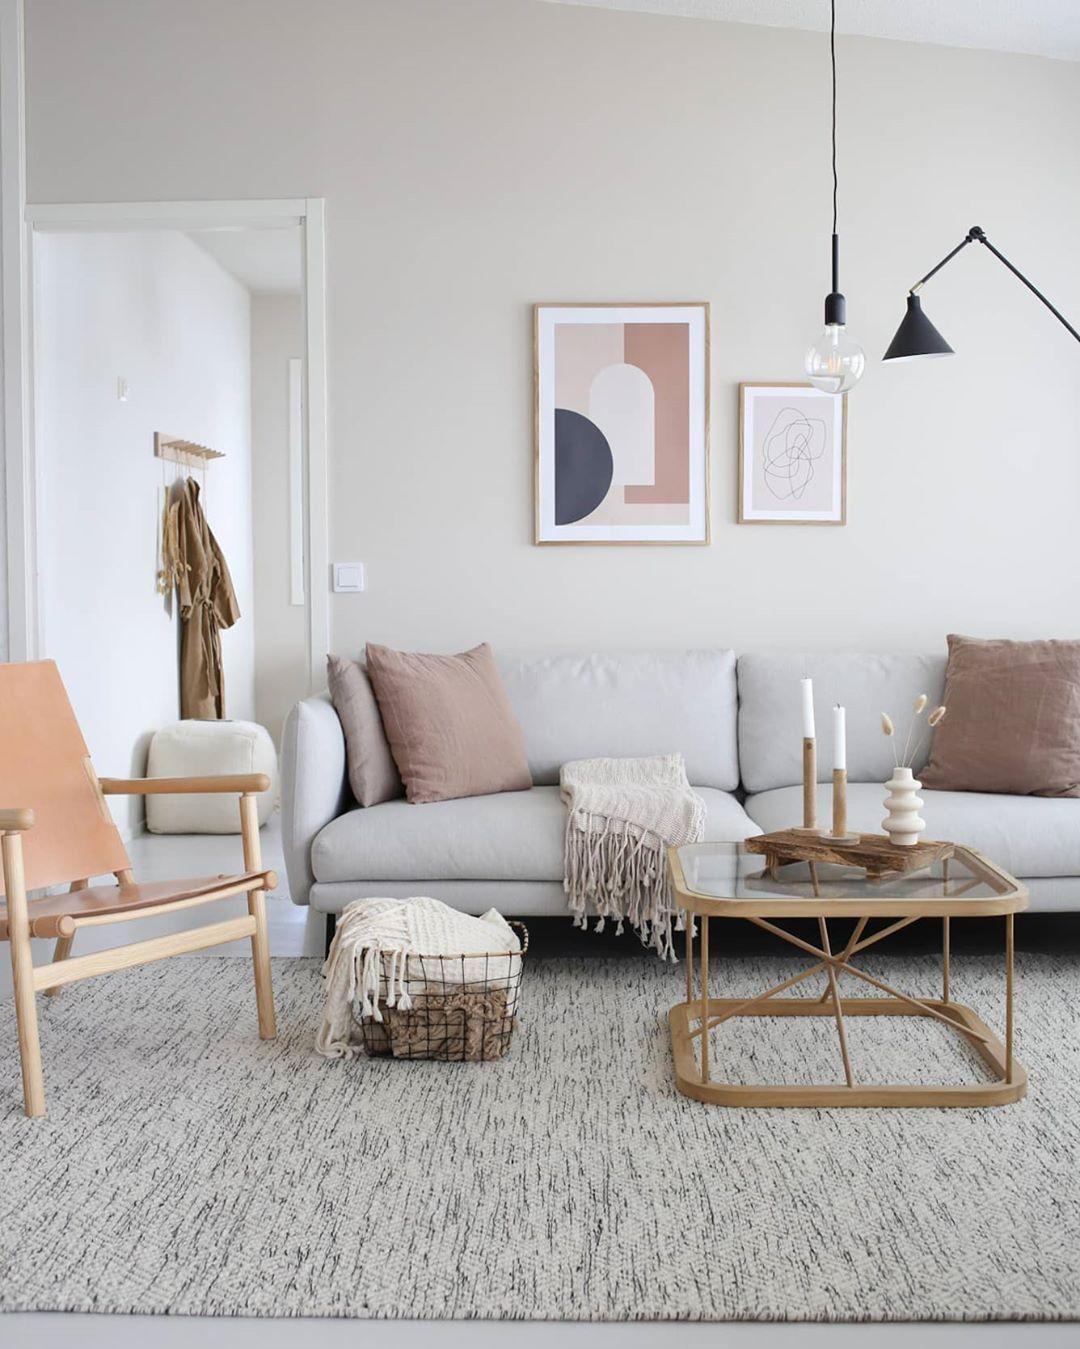 You Never Find Scandinavian Interior Design Guides That Go Into T Scandanavian Interiors Living Room Nordic Style Living Room Scandinavian Interior Living Room Scandinavian decor living room